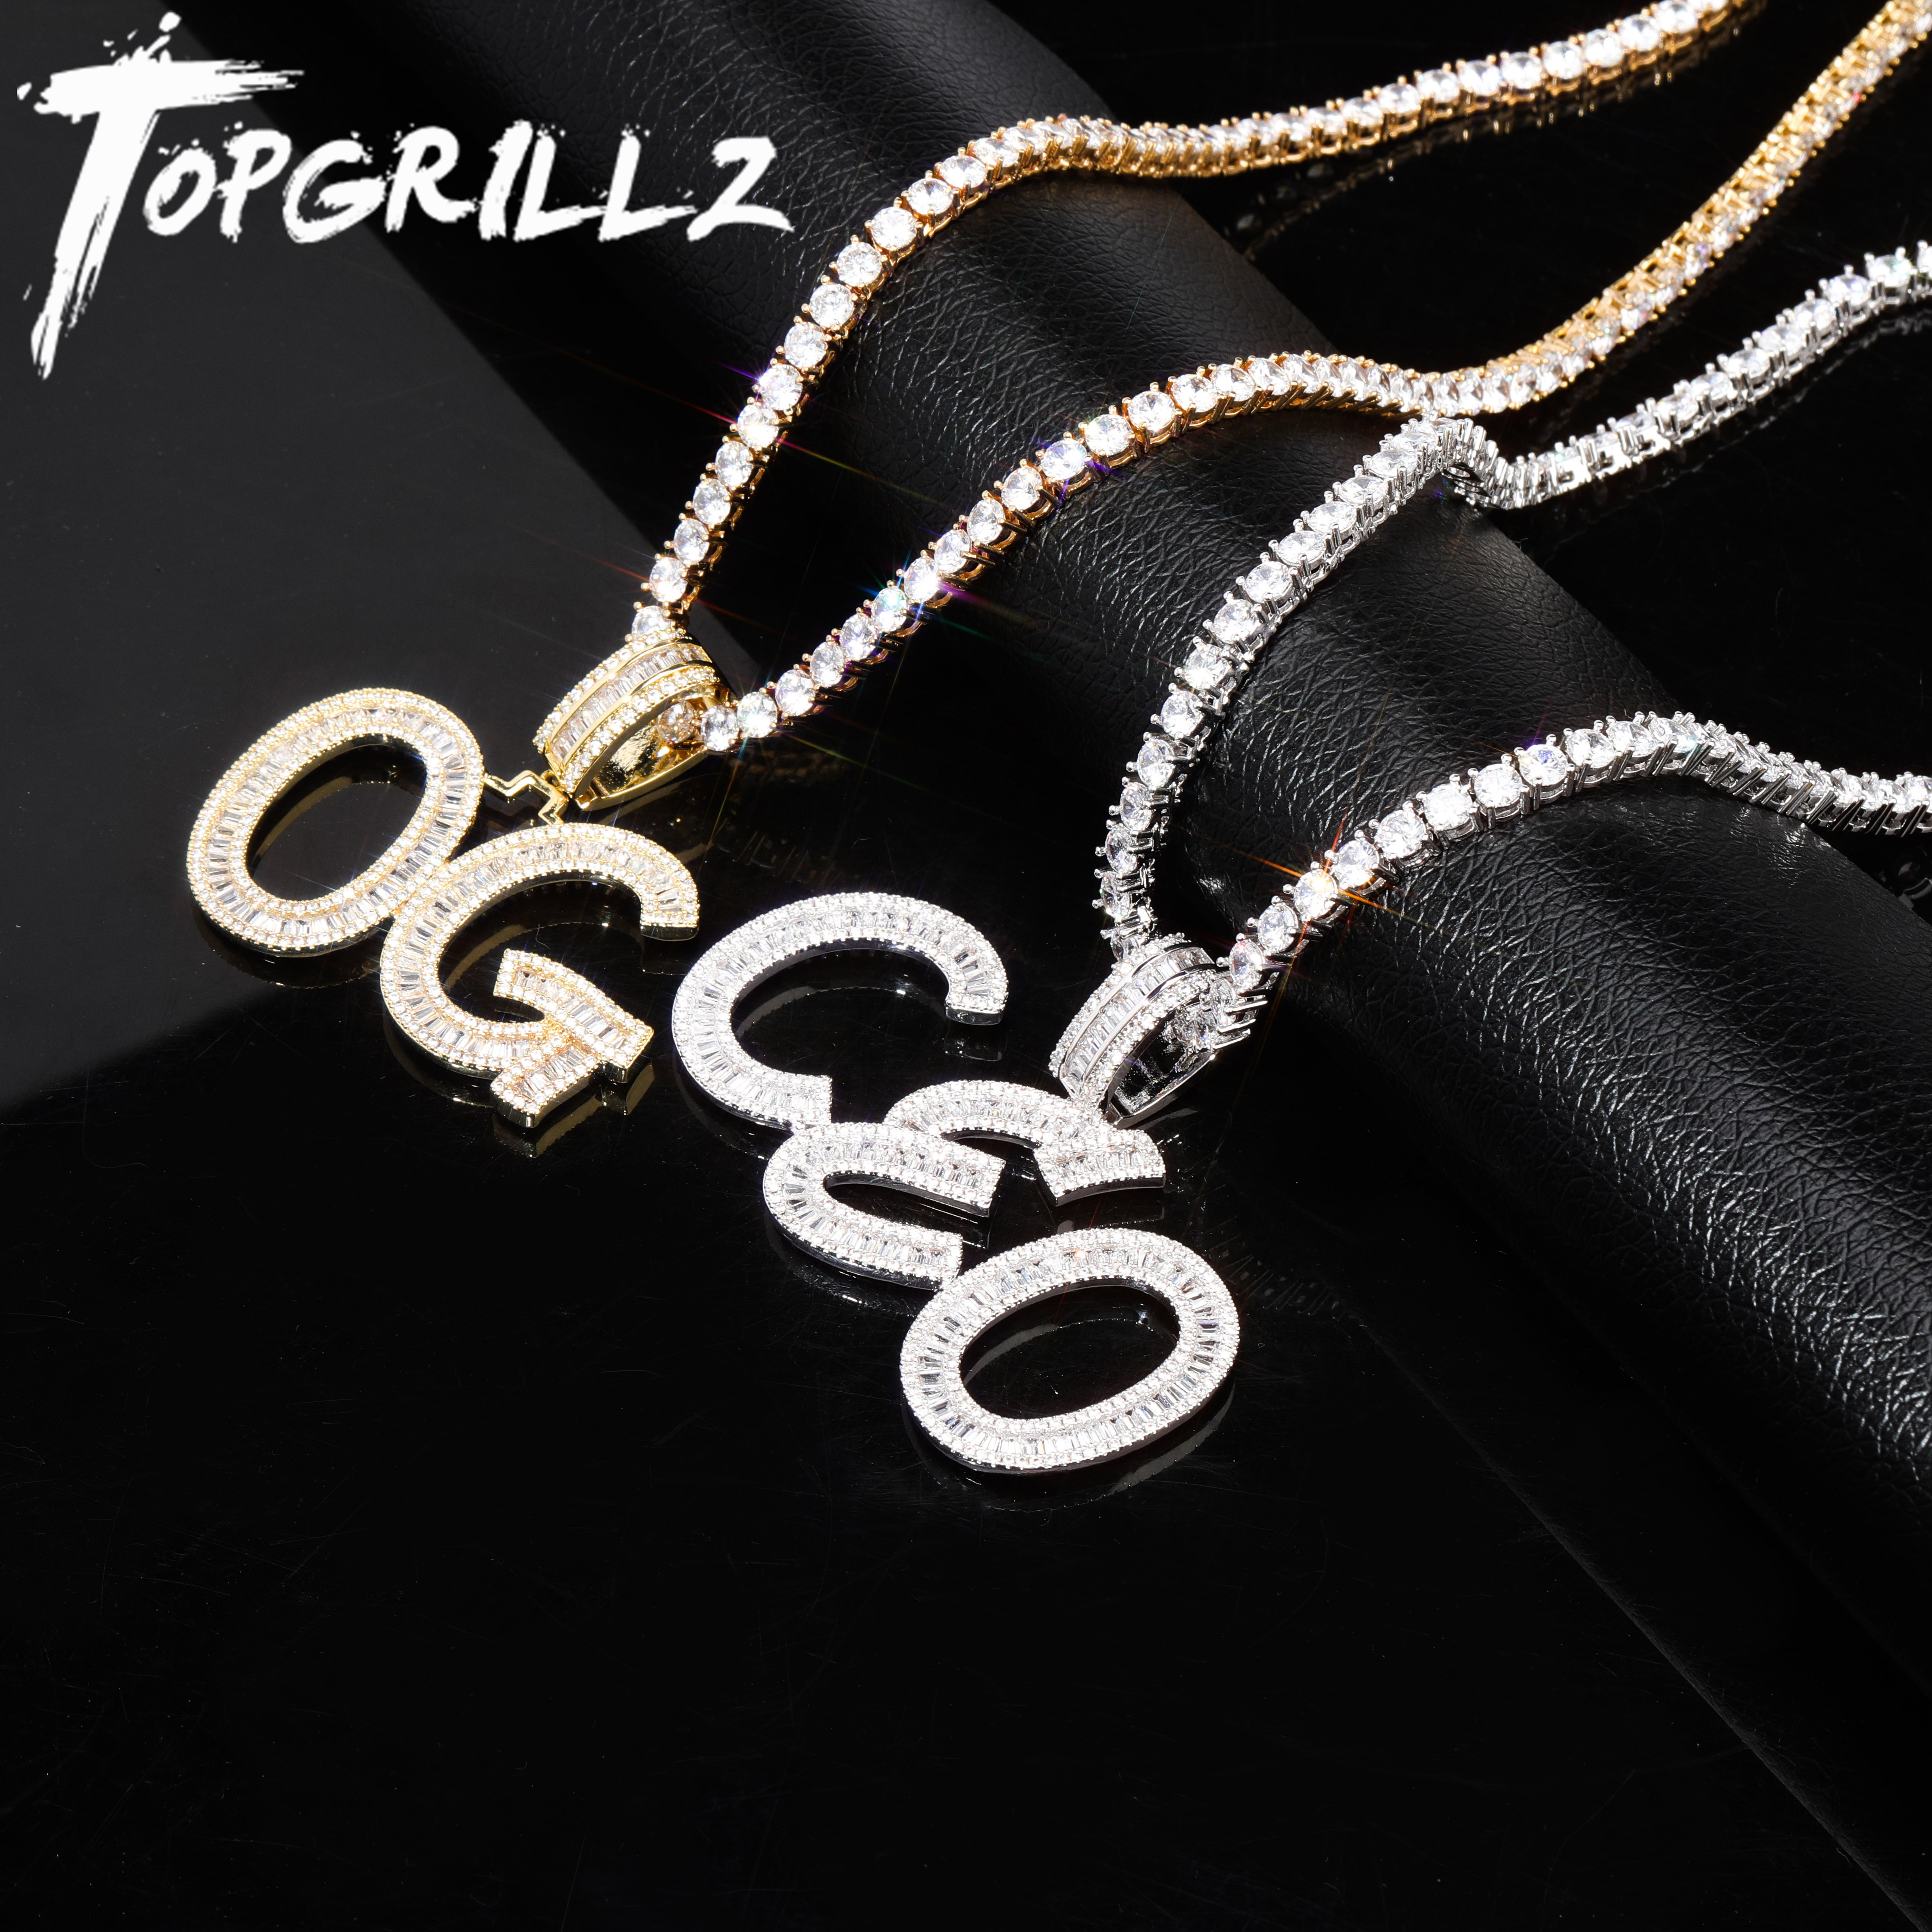 TOPGRILLZ Custom Name Baguette Letters Hip Hop Pendant Chain Gold Silver Bling Zirconia Men's Hip Hop Pendant Jewelry|Customized Necklaces| - AliExpress